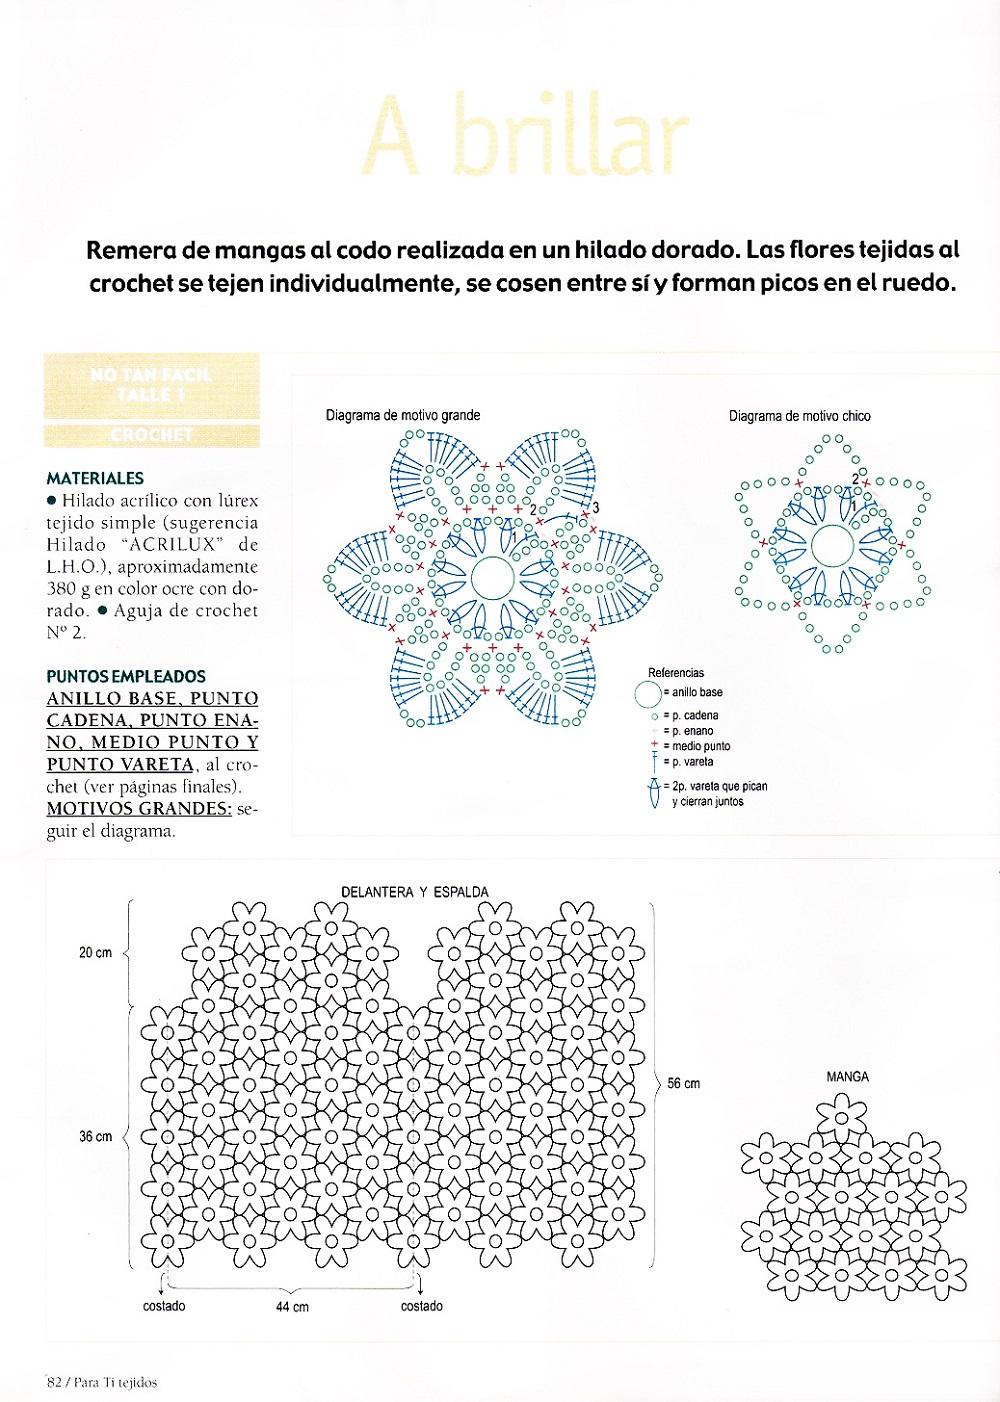 Jersey media manga de flores 6 pétalos